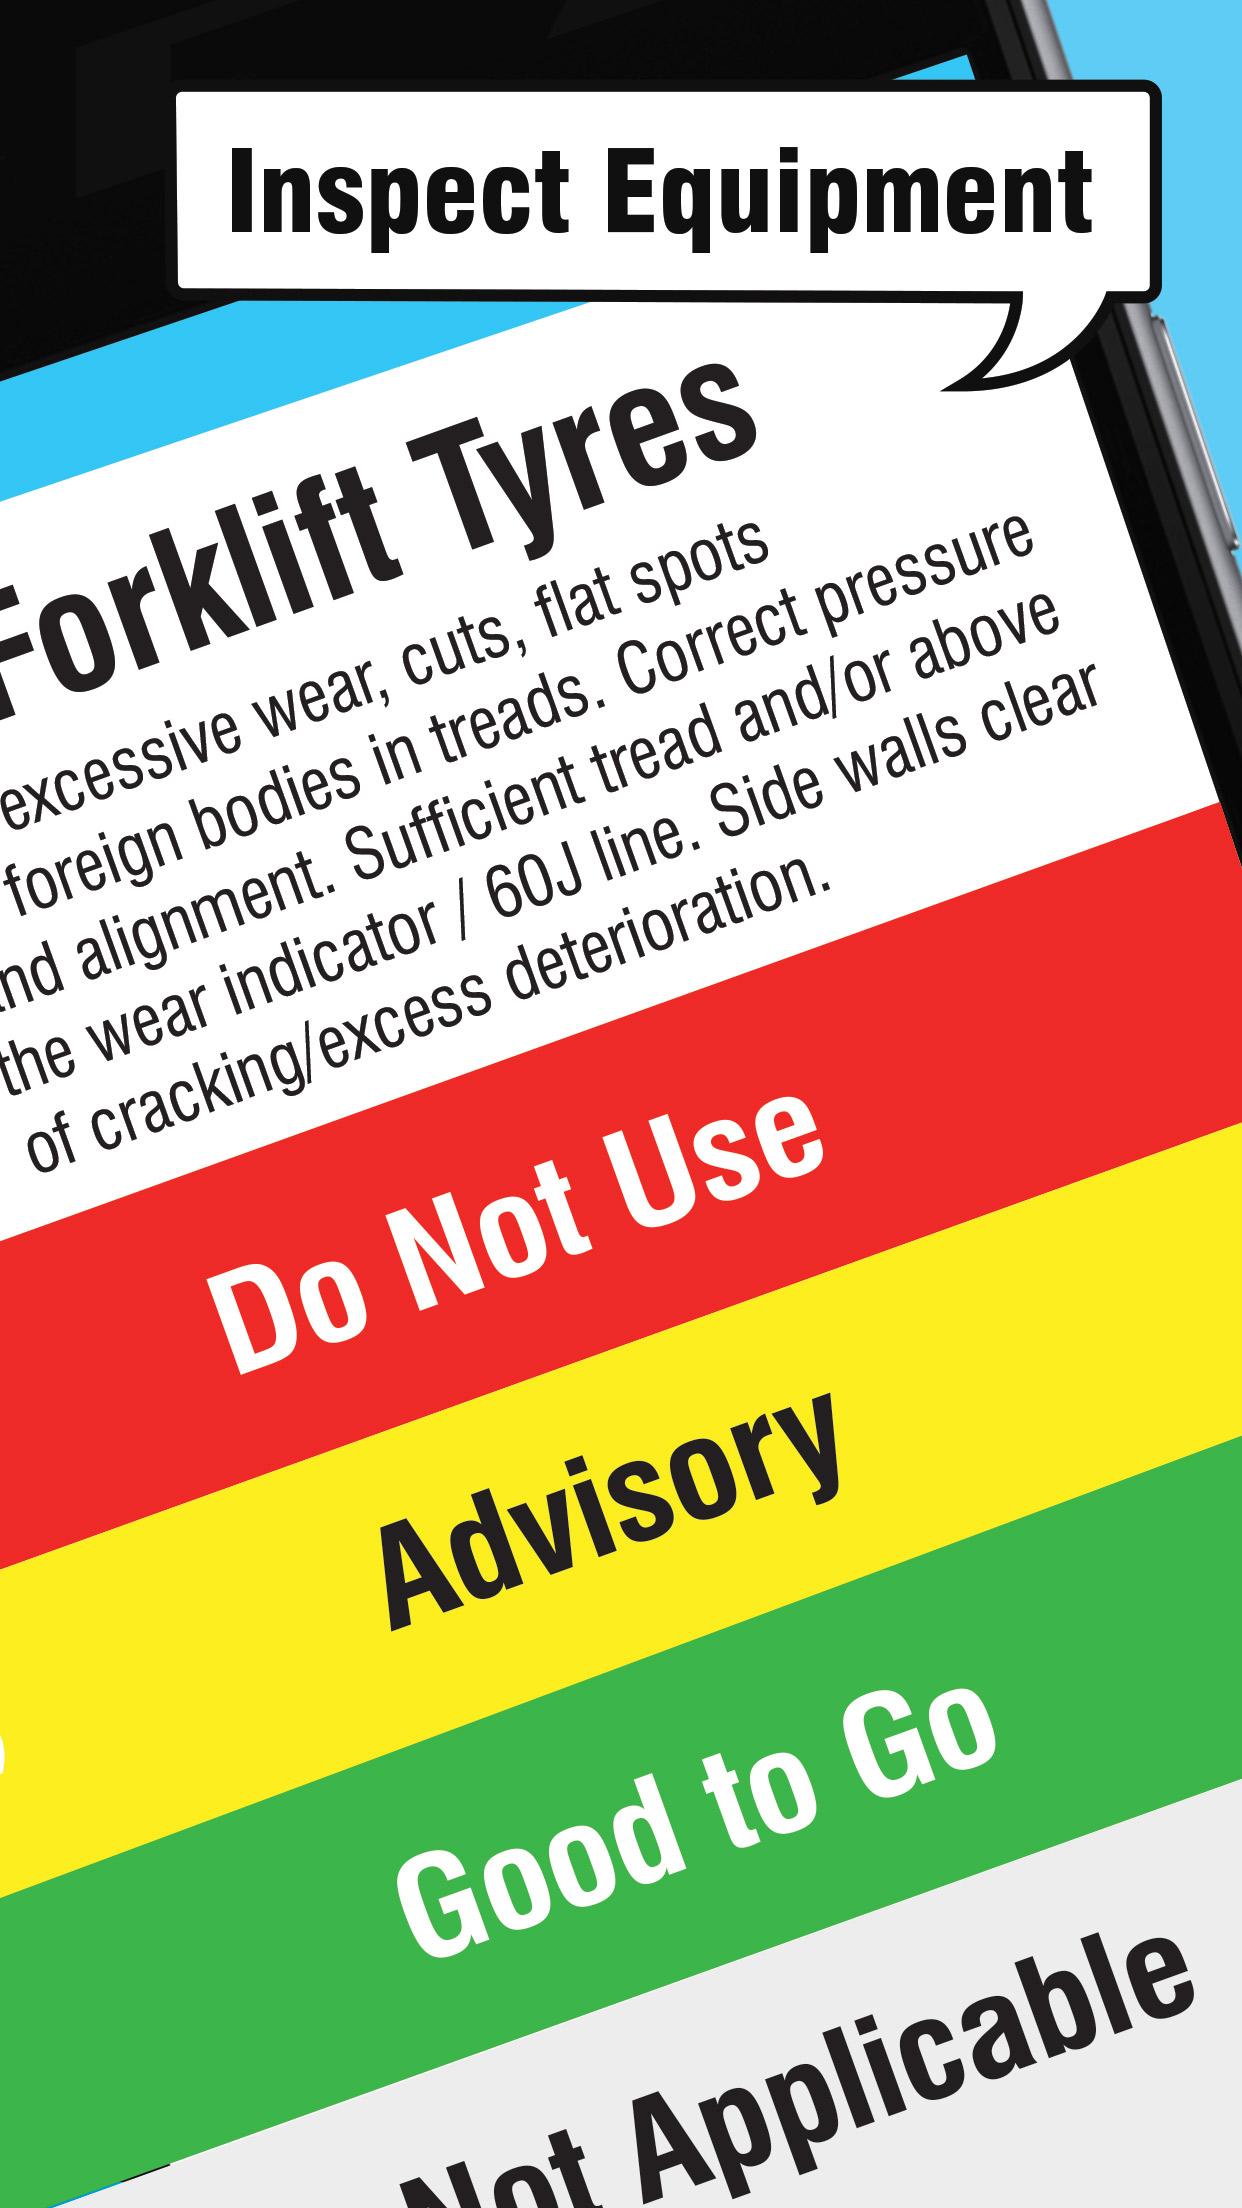 Equipment checklists